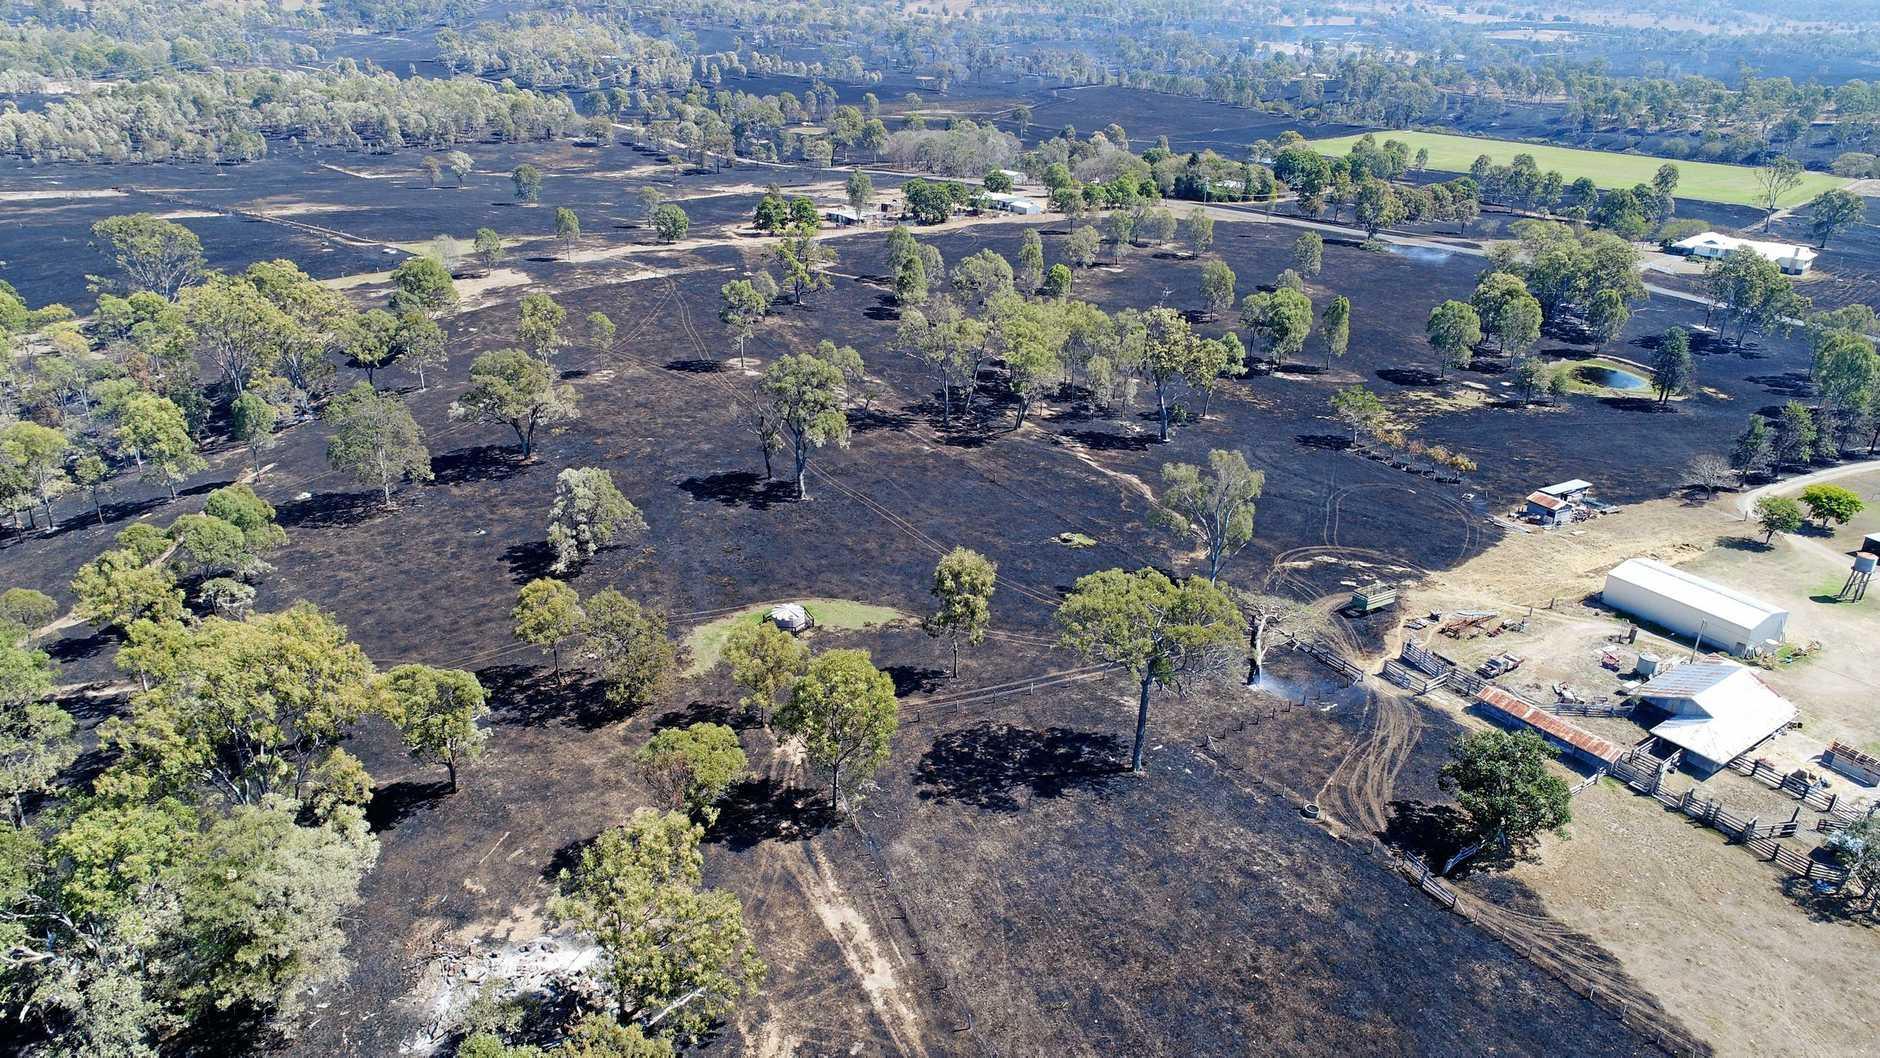 Drone photo of Woolooga fire devastationDCIM\100MEDIA\DJI_0356.JPG